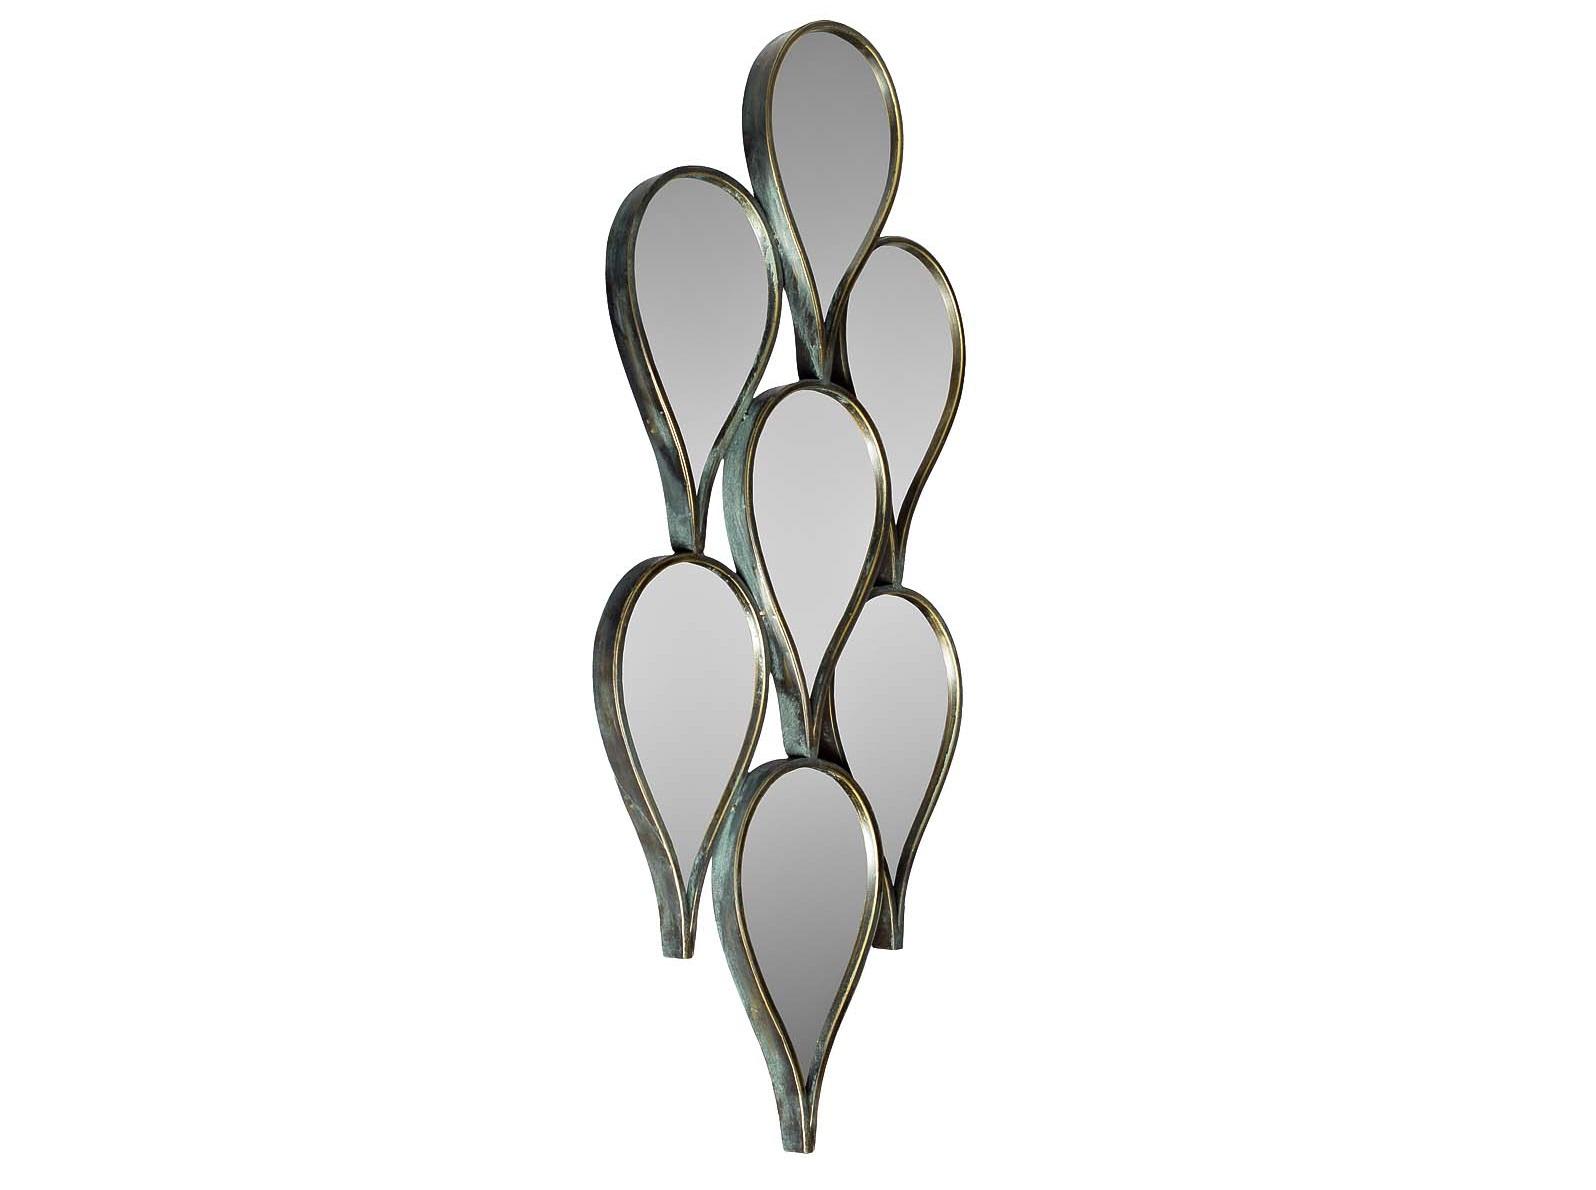 Зеркало КаплиНастенные зеркала<br><br><br>Material: Металл<br>Ширина см: 43<br>Высота см: 100<br>Глубина см: 5